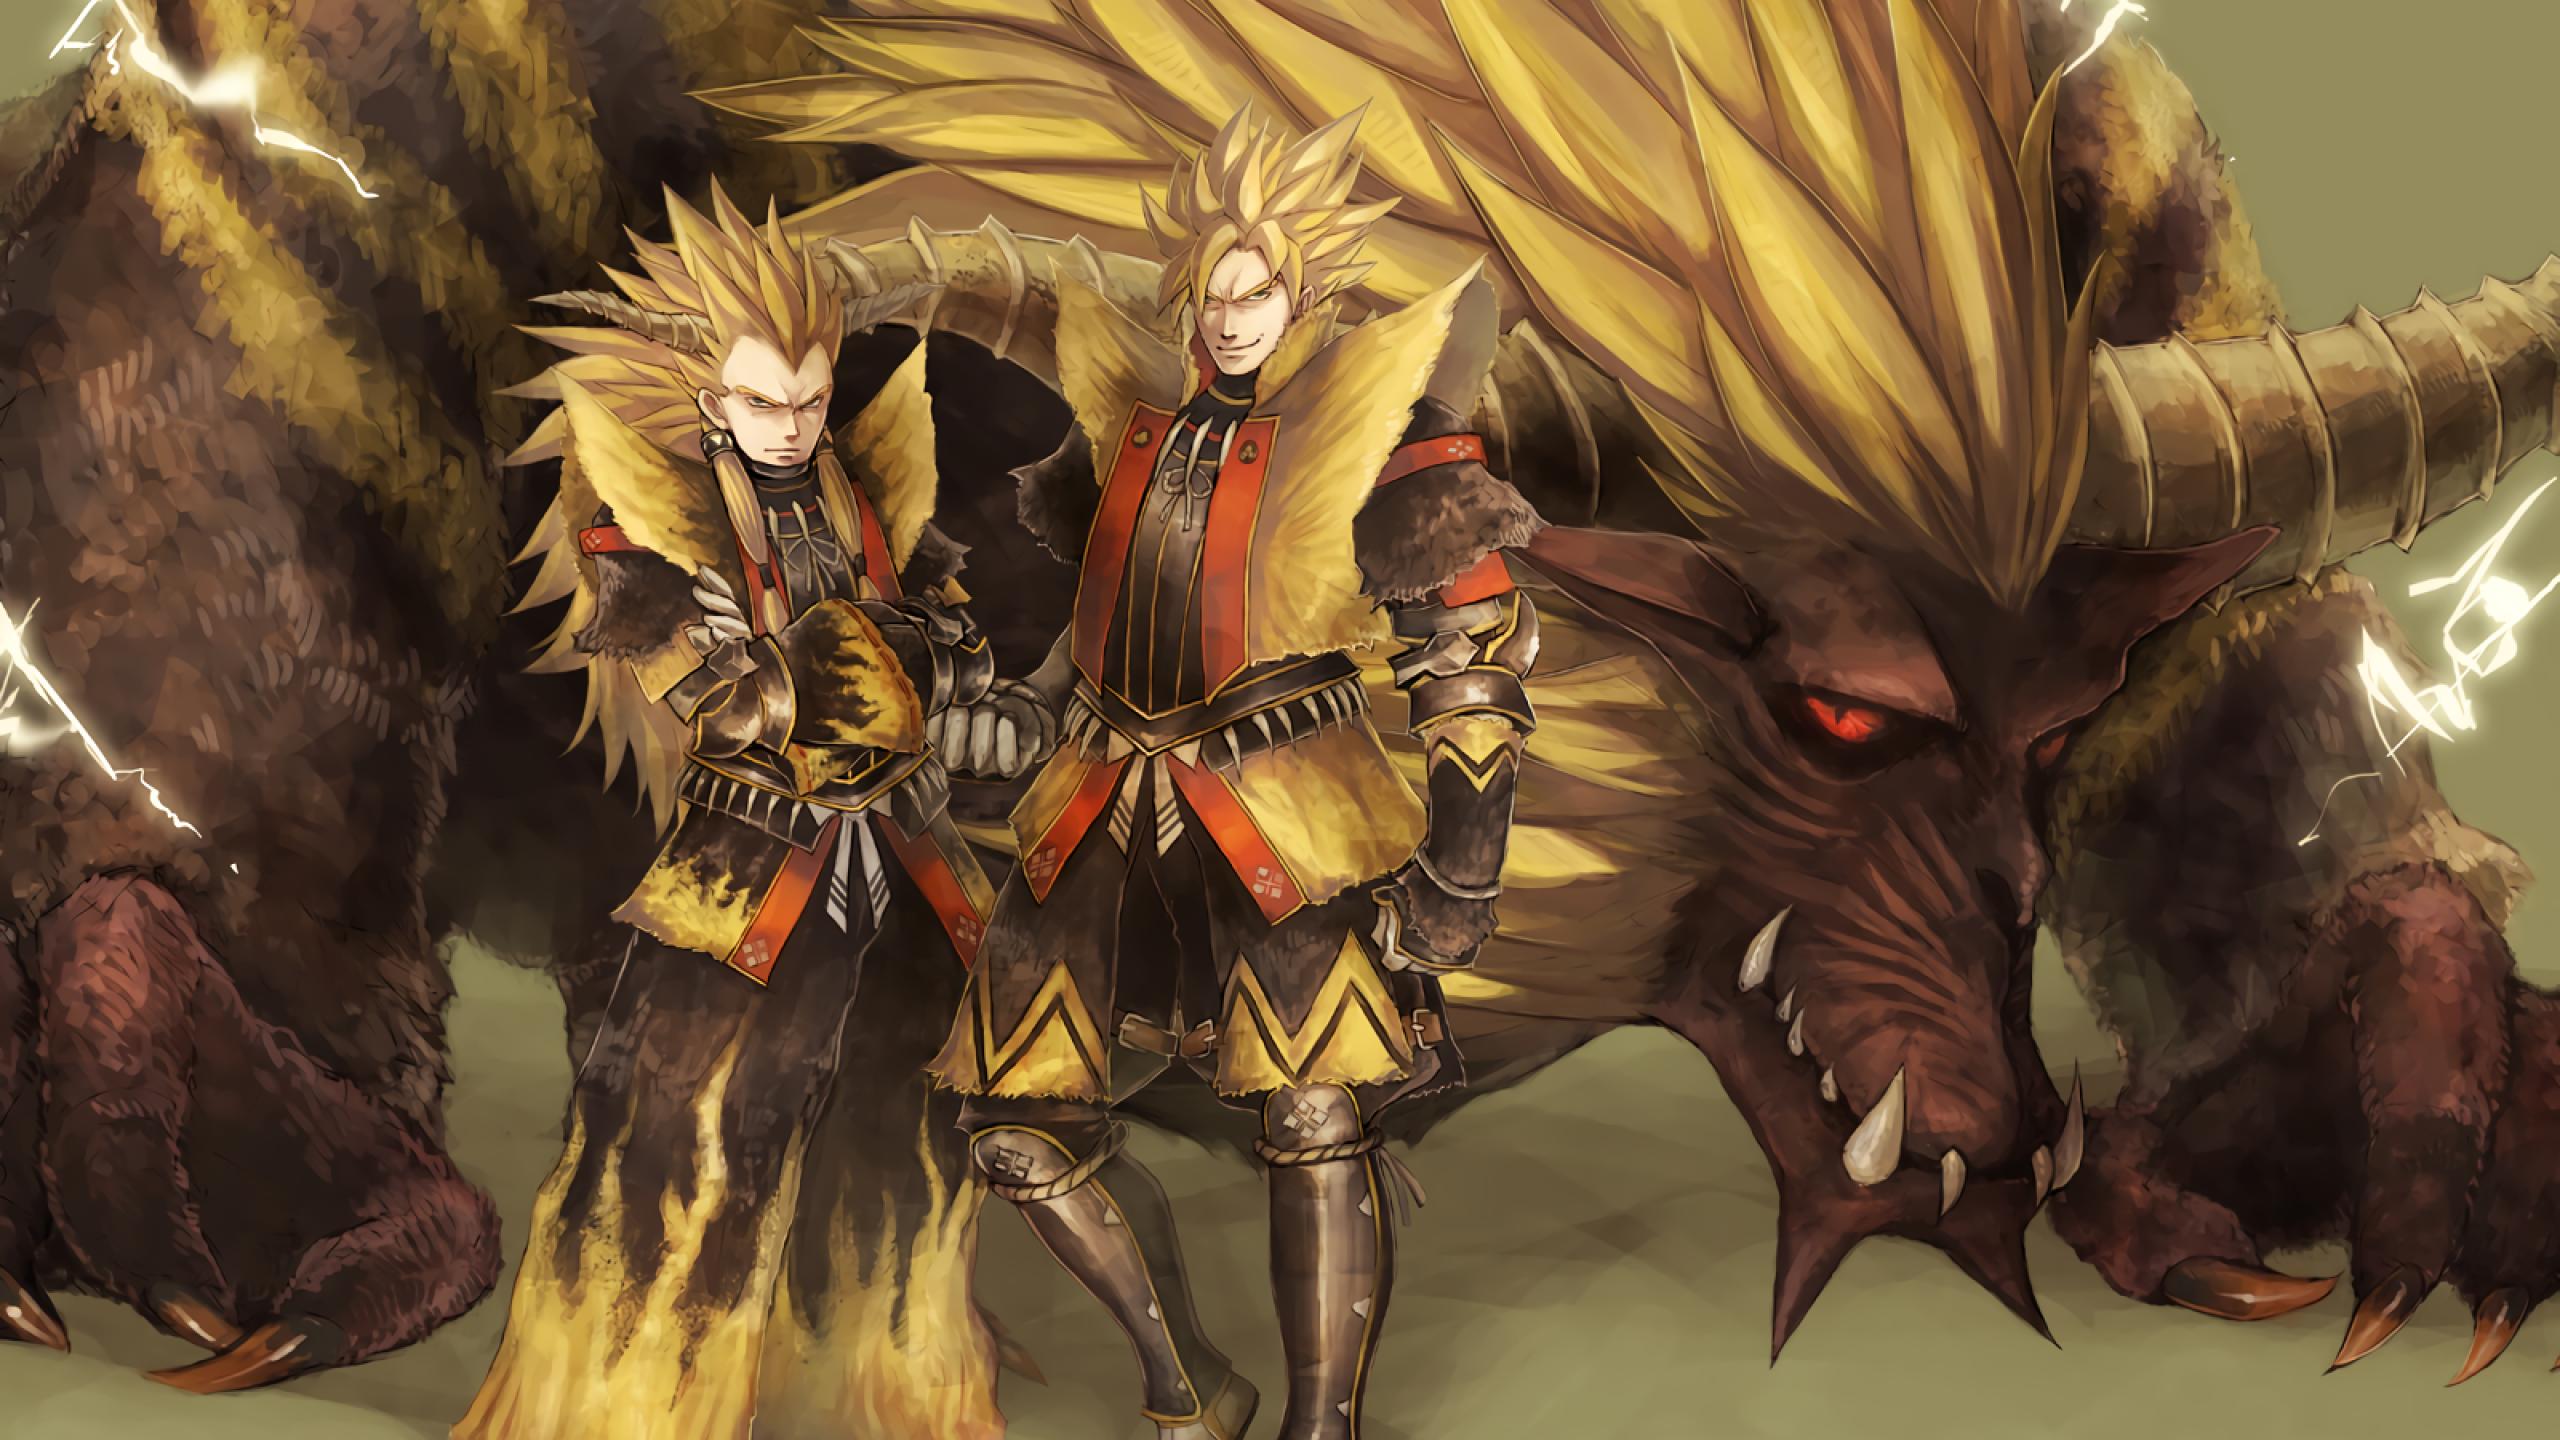 Download 2560x1440 Dragon Ball Z Goku Vegata Monster Hunter 2560x1440